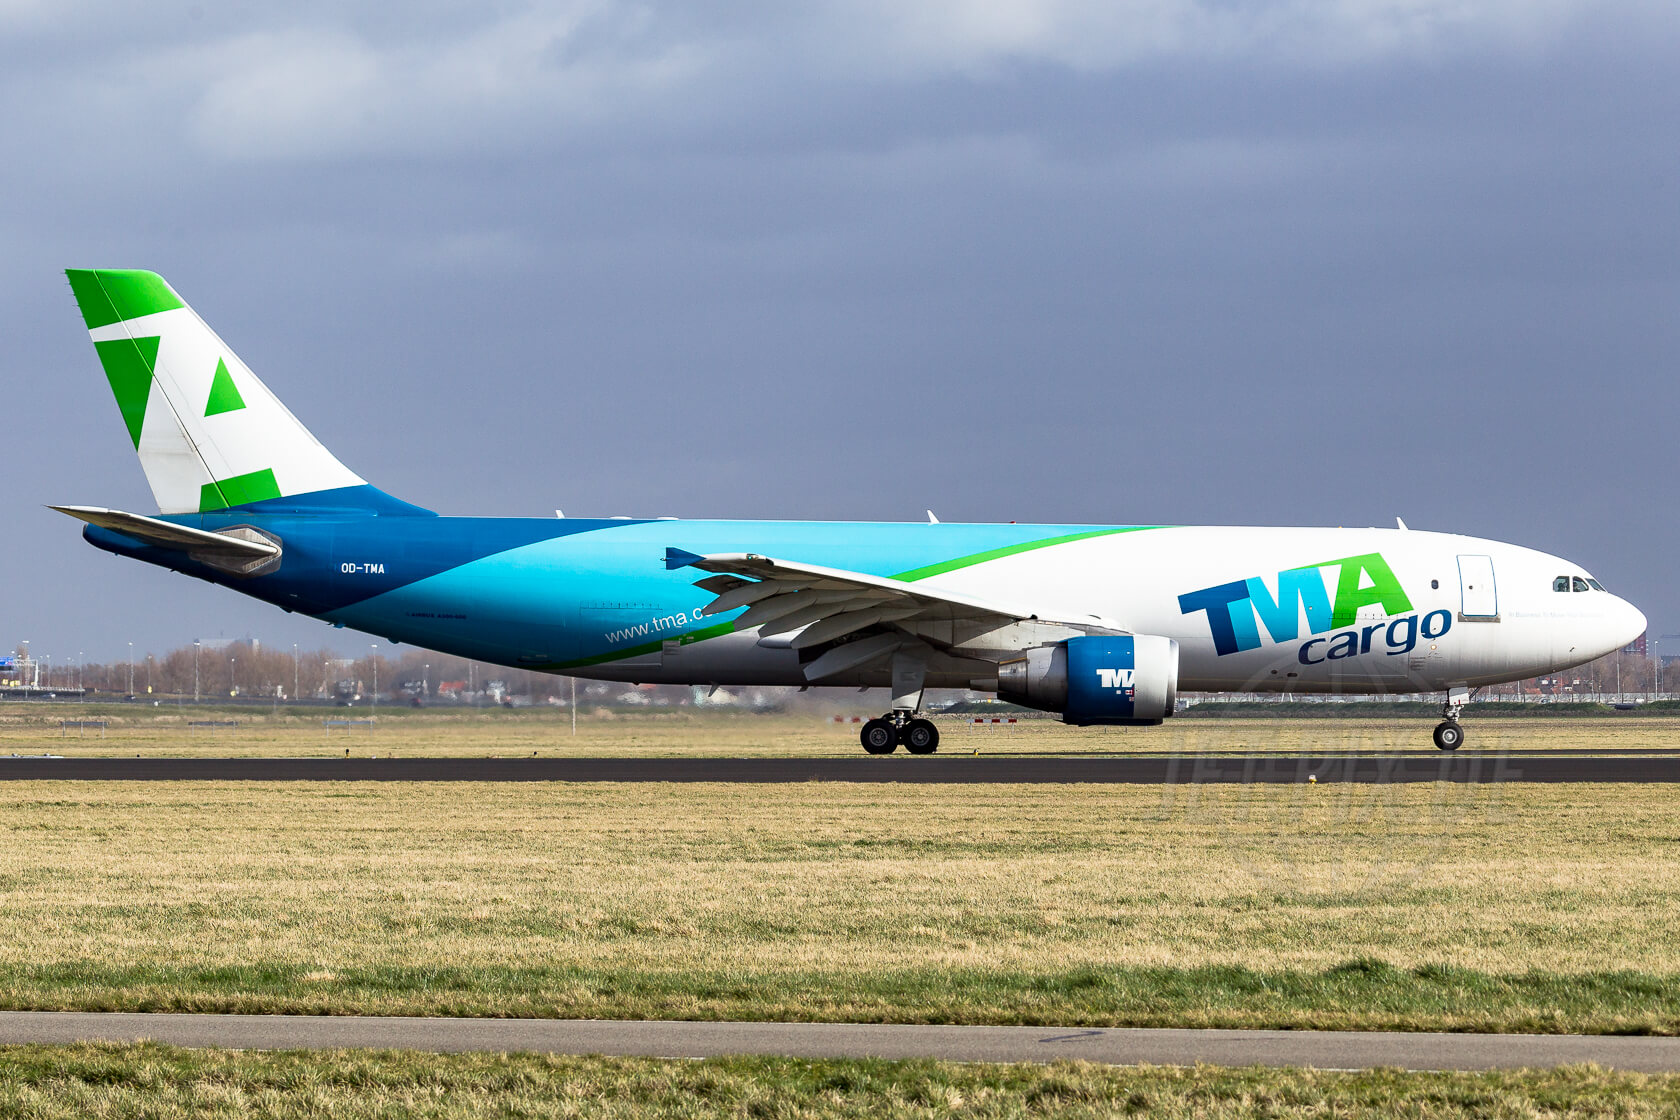 OD-TMA TMA Cargo Airbus A300 2014 02 15 EHAM Amsterdam Schiphol Polderbaan Spotting Spotter Guide Best Weather bestes Wetter Classic Klassiker Flieger Jet Plane